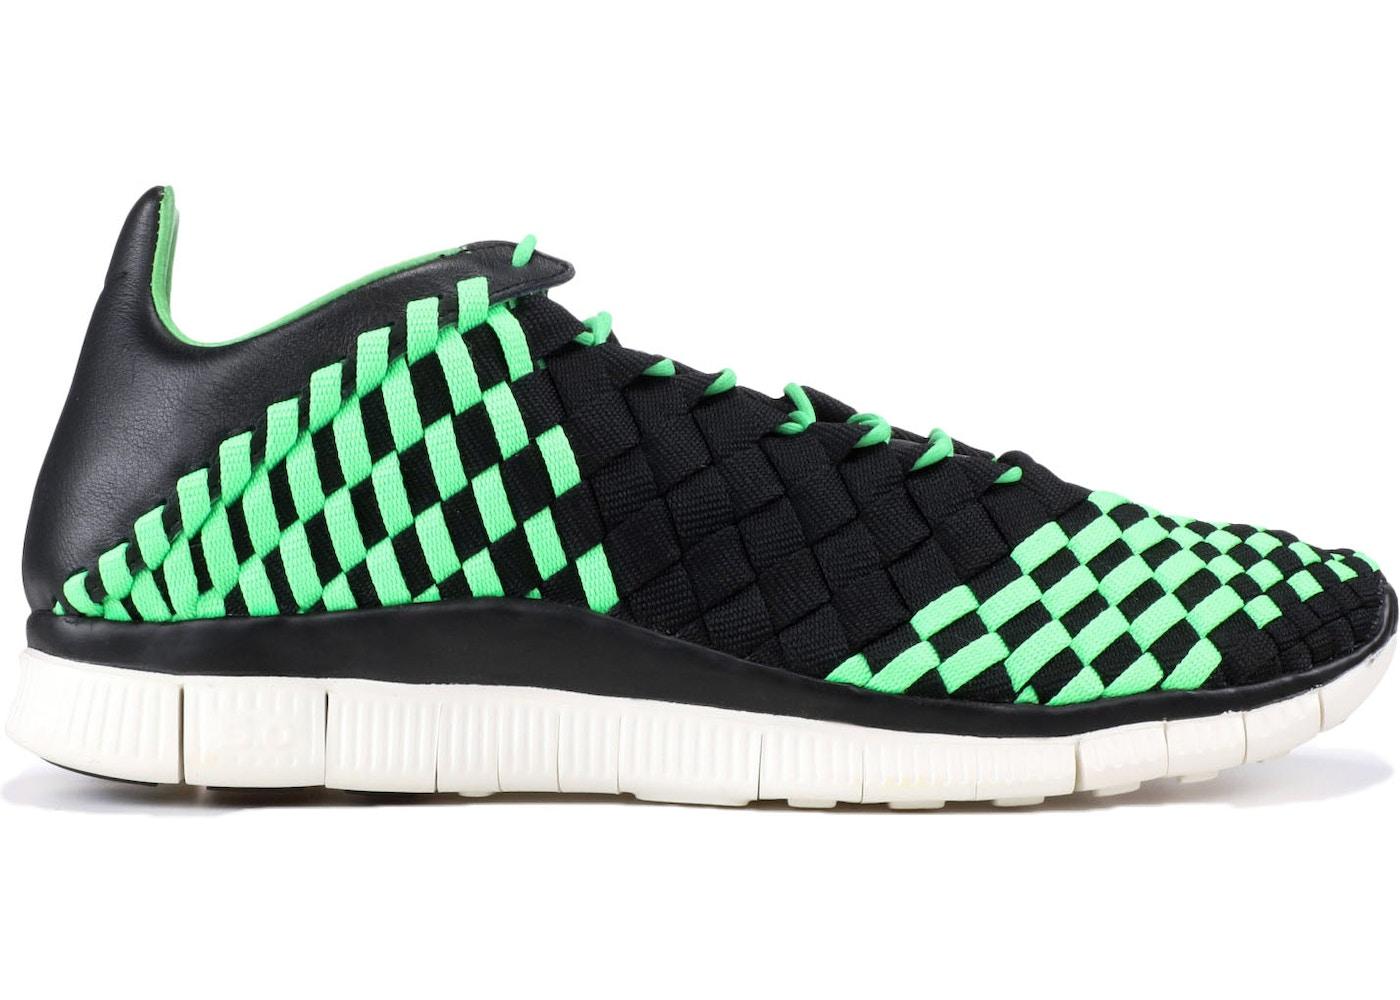 a03360813d65 Nike Free Inneva Woven Black Poison Green - 579916-030